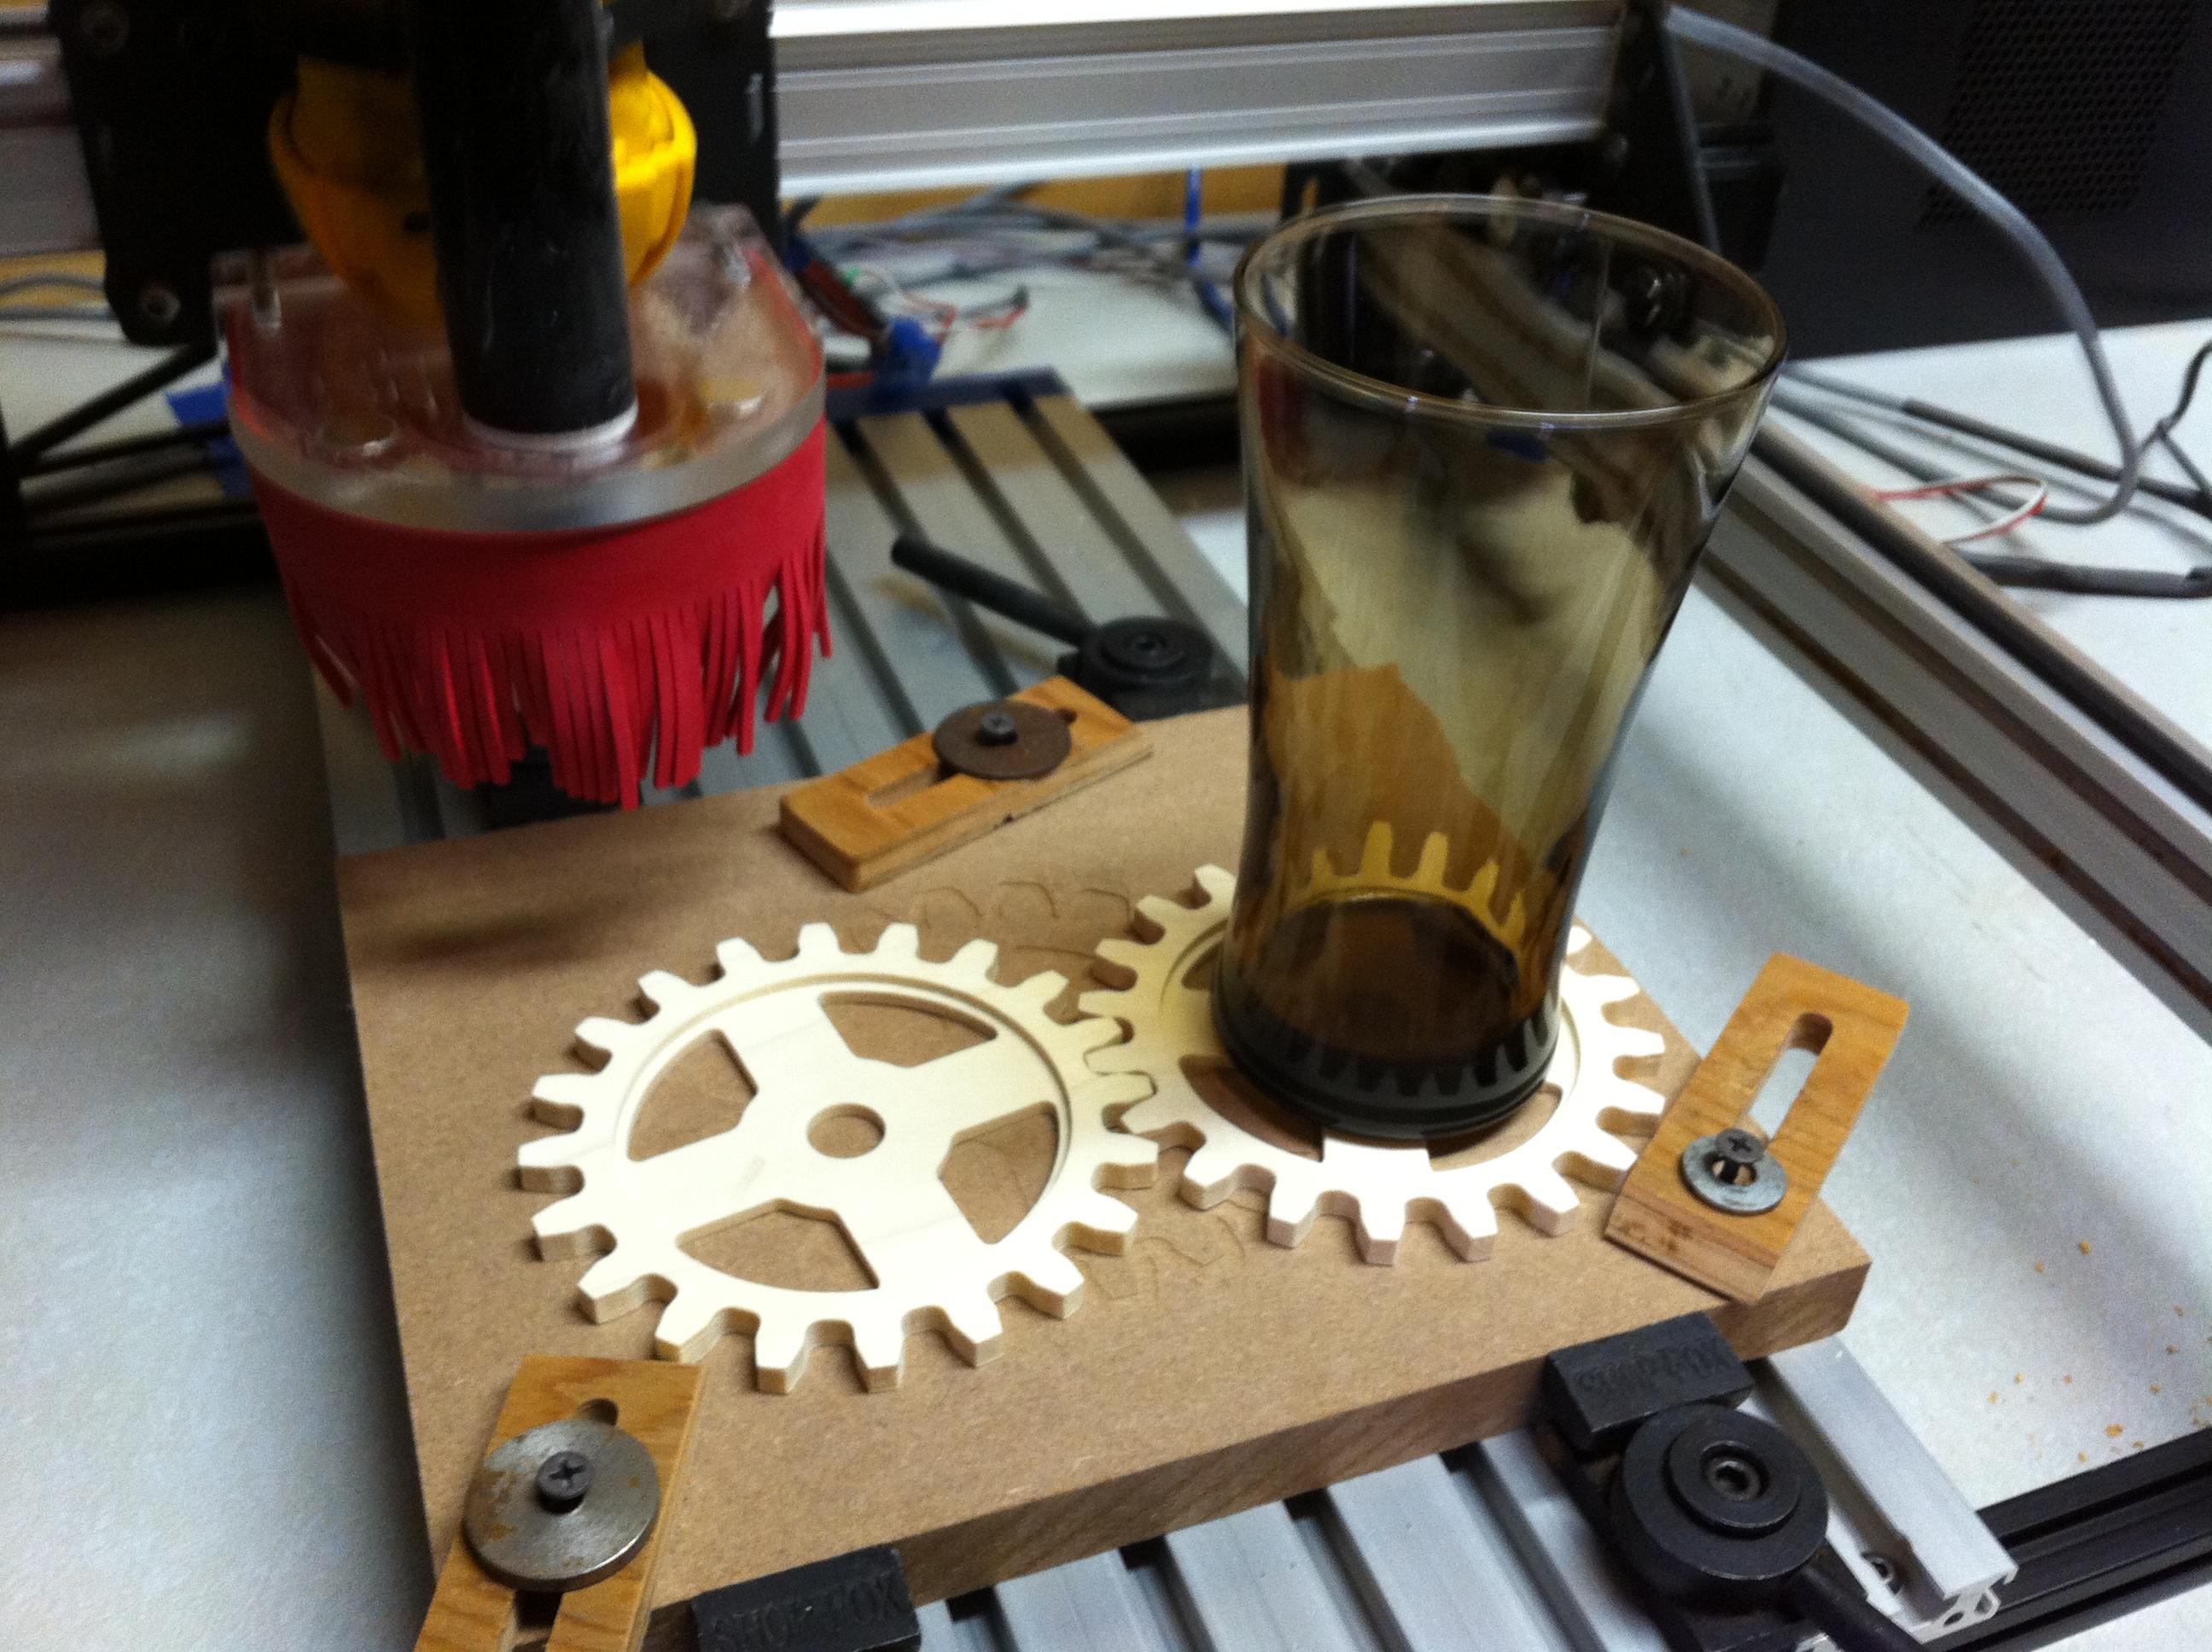 CNC Gear Coaster